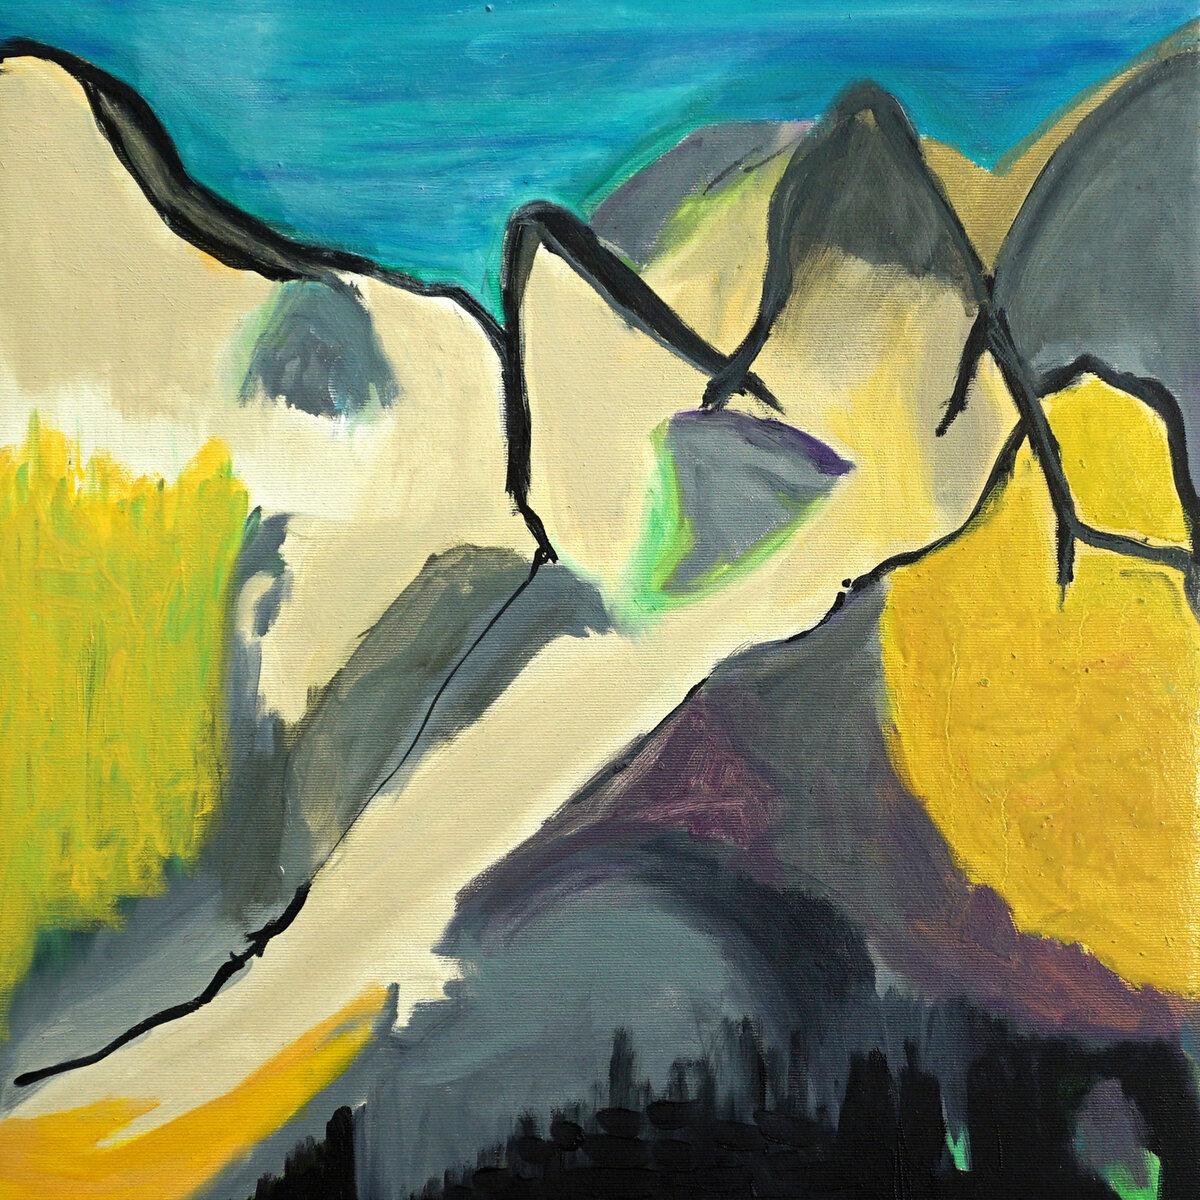 Miae Kim, Wachsende Berge (Ausschnitt), 2021, Öl auf Leinwan 60 x 50 cm